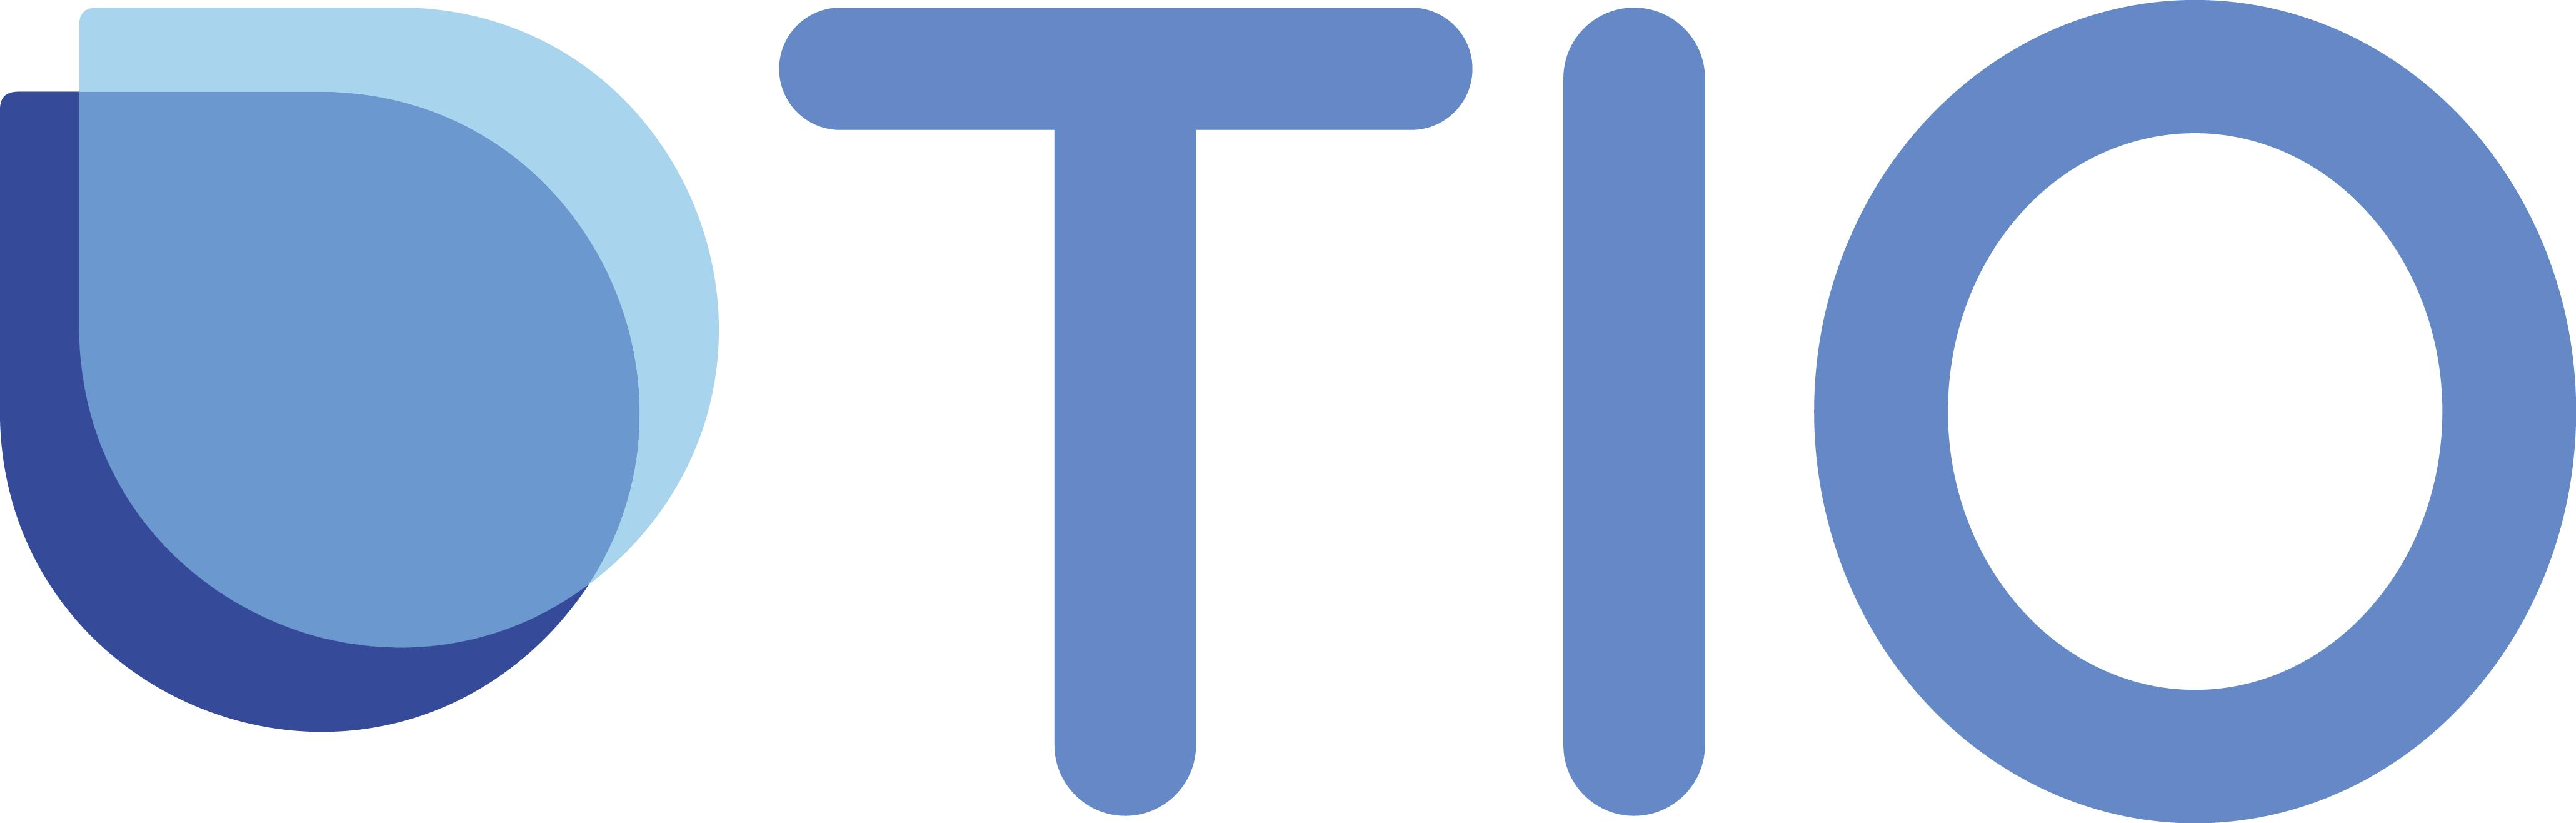 Topmoderne TIO biobaseret tandbørstehoveder til Braun Oral-B tandbørste. UC-11